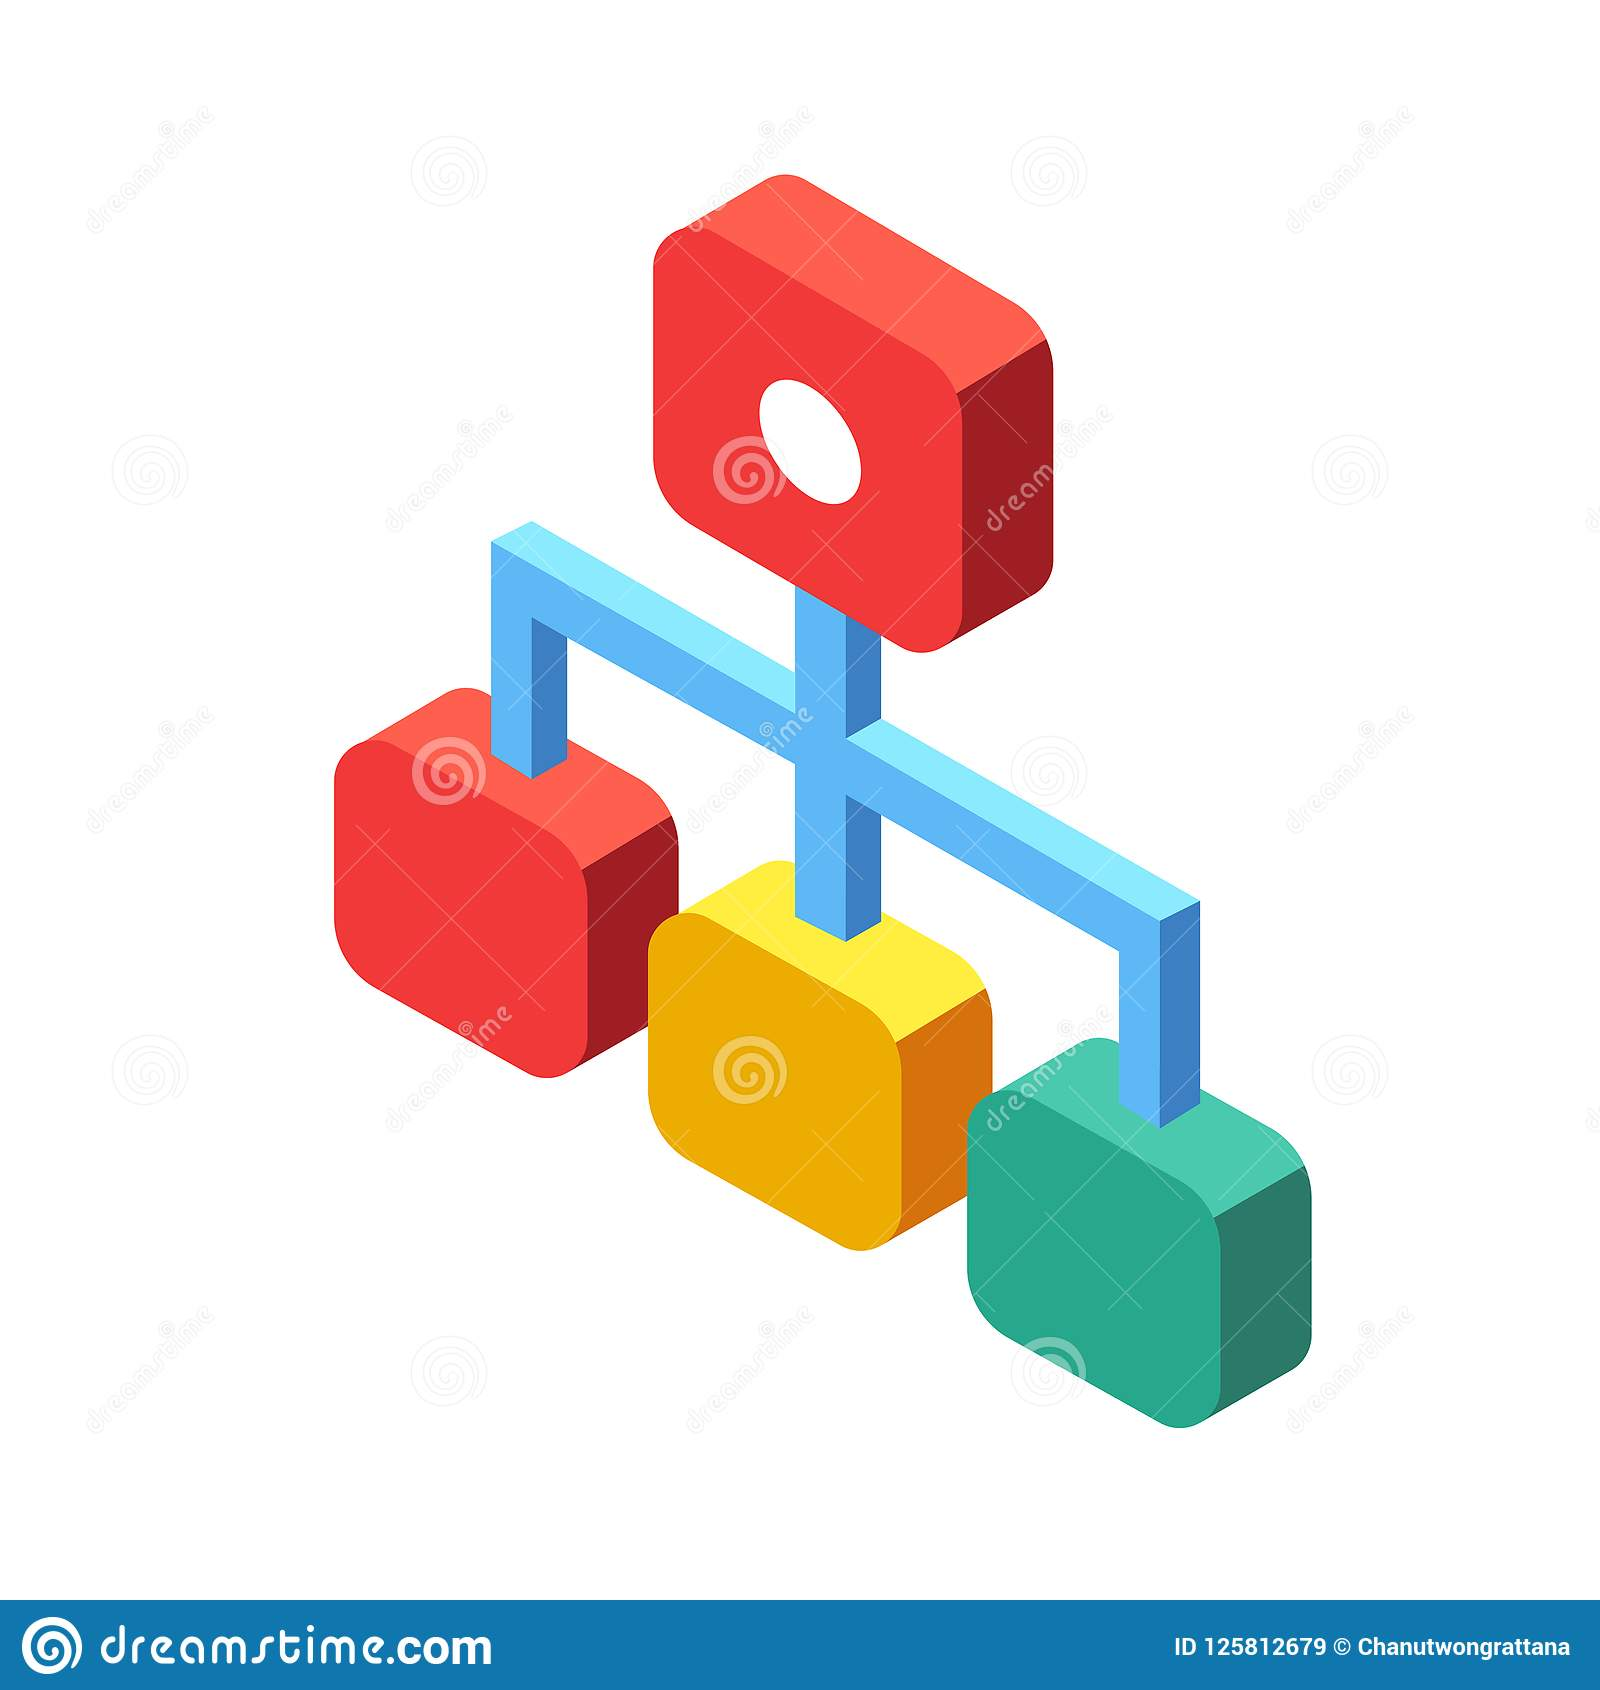 Flowchart Isometric Illustration